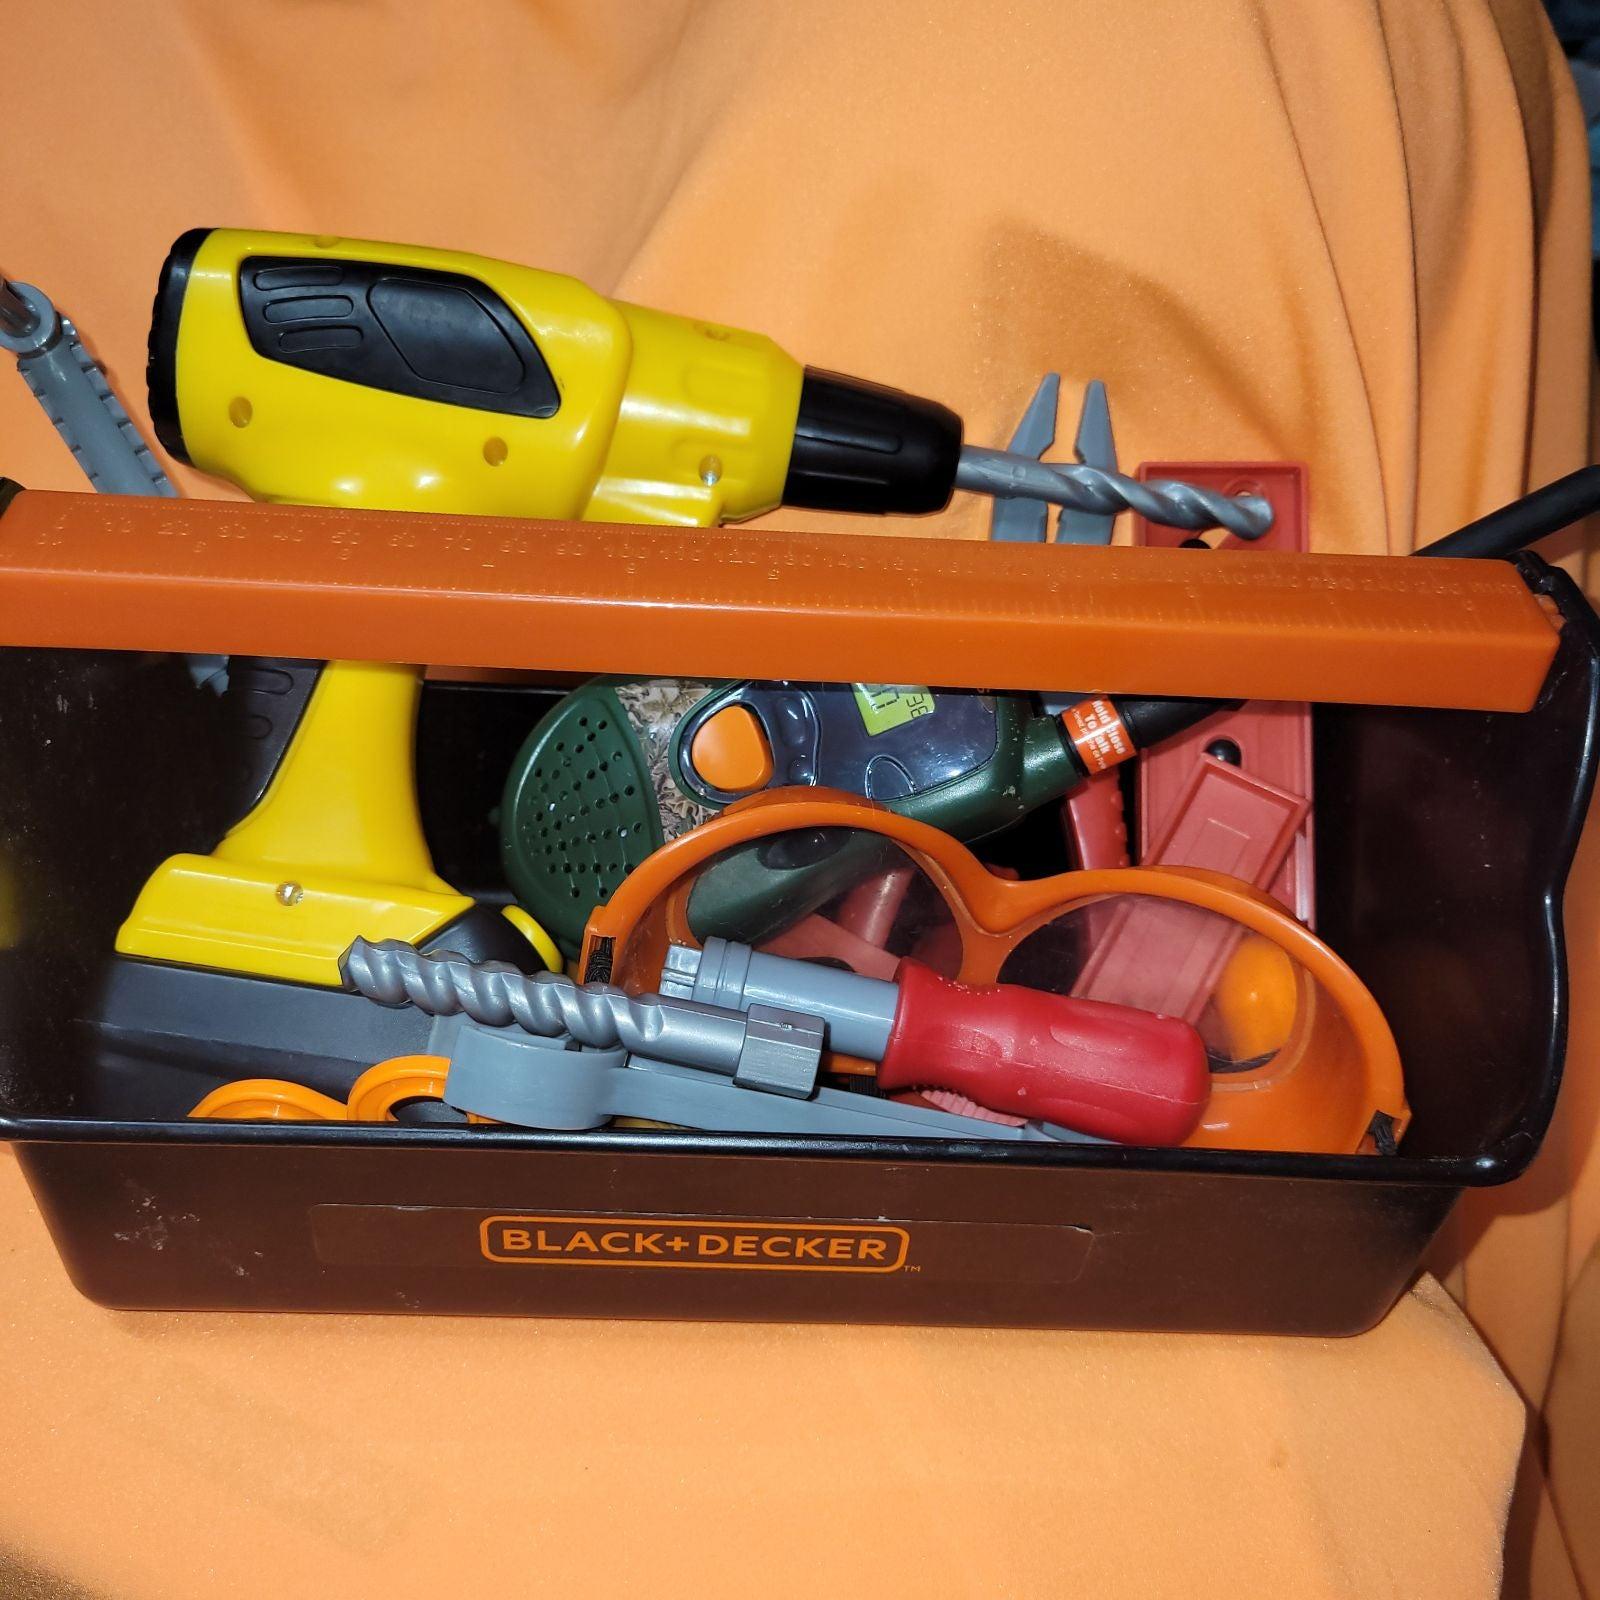 Toy tool box